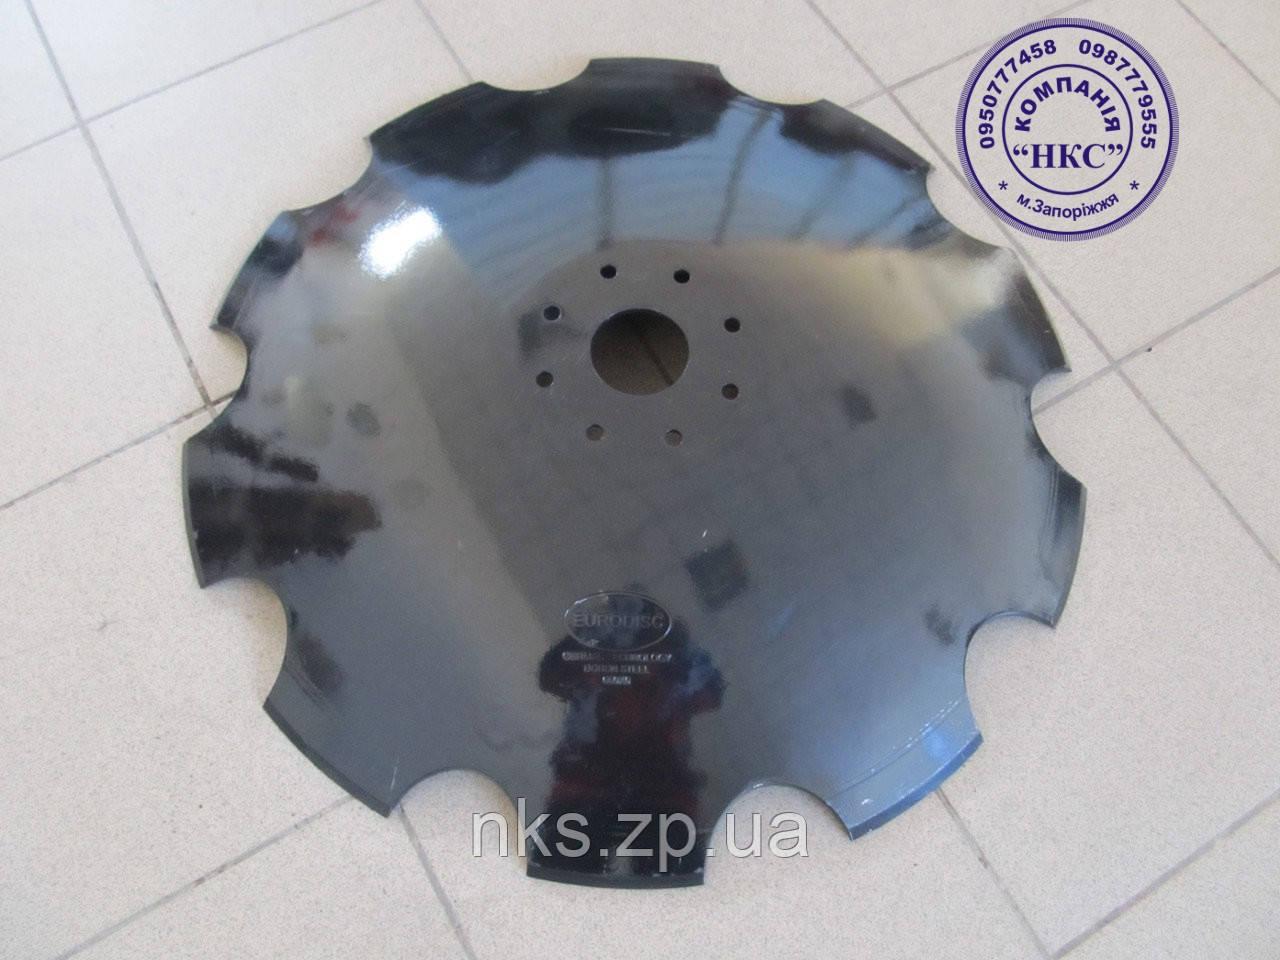 Диск ромашка (бориров) 660х6 УДА-4,5 Eurodisk.